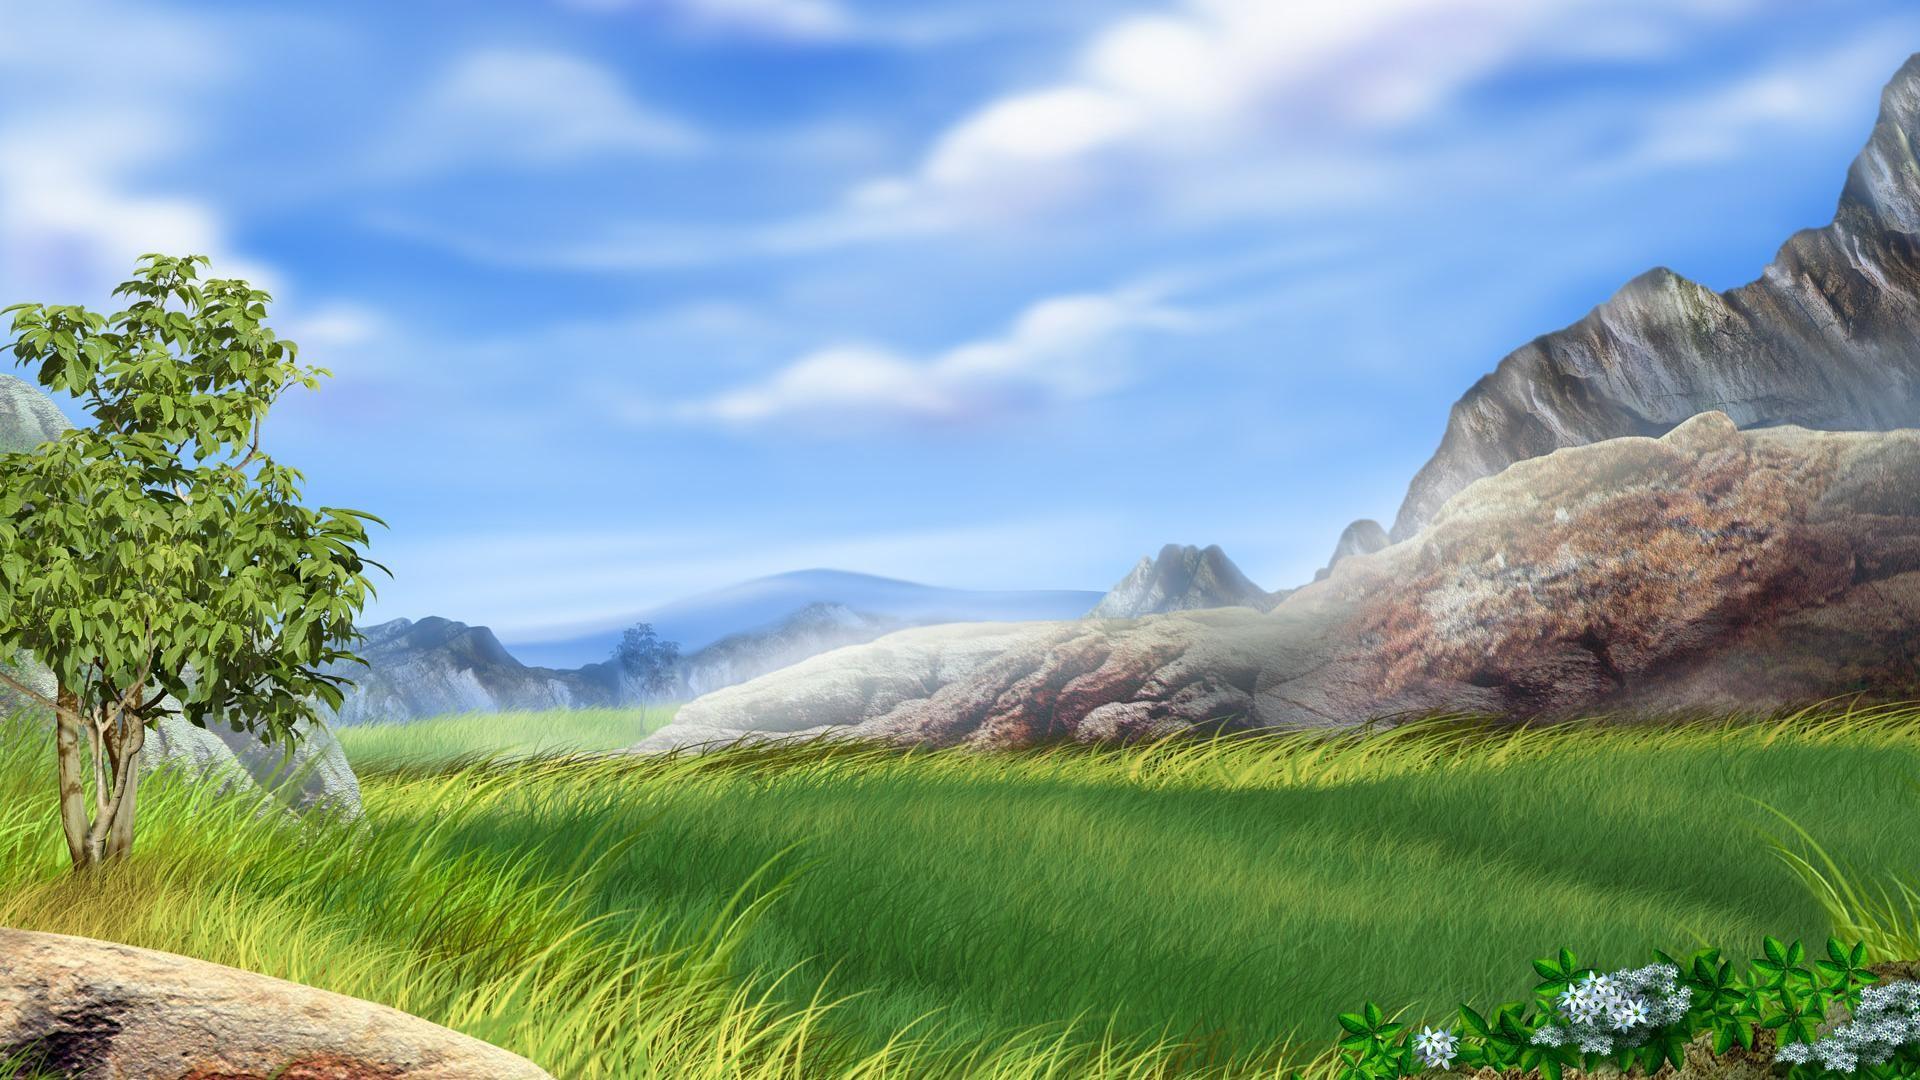 hd Vector field landscape backgrounds wide wallpapers:1280×800,1440×900,1680×1050  – hd